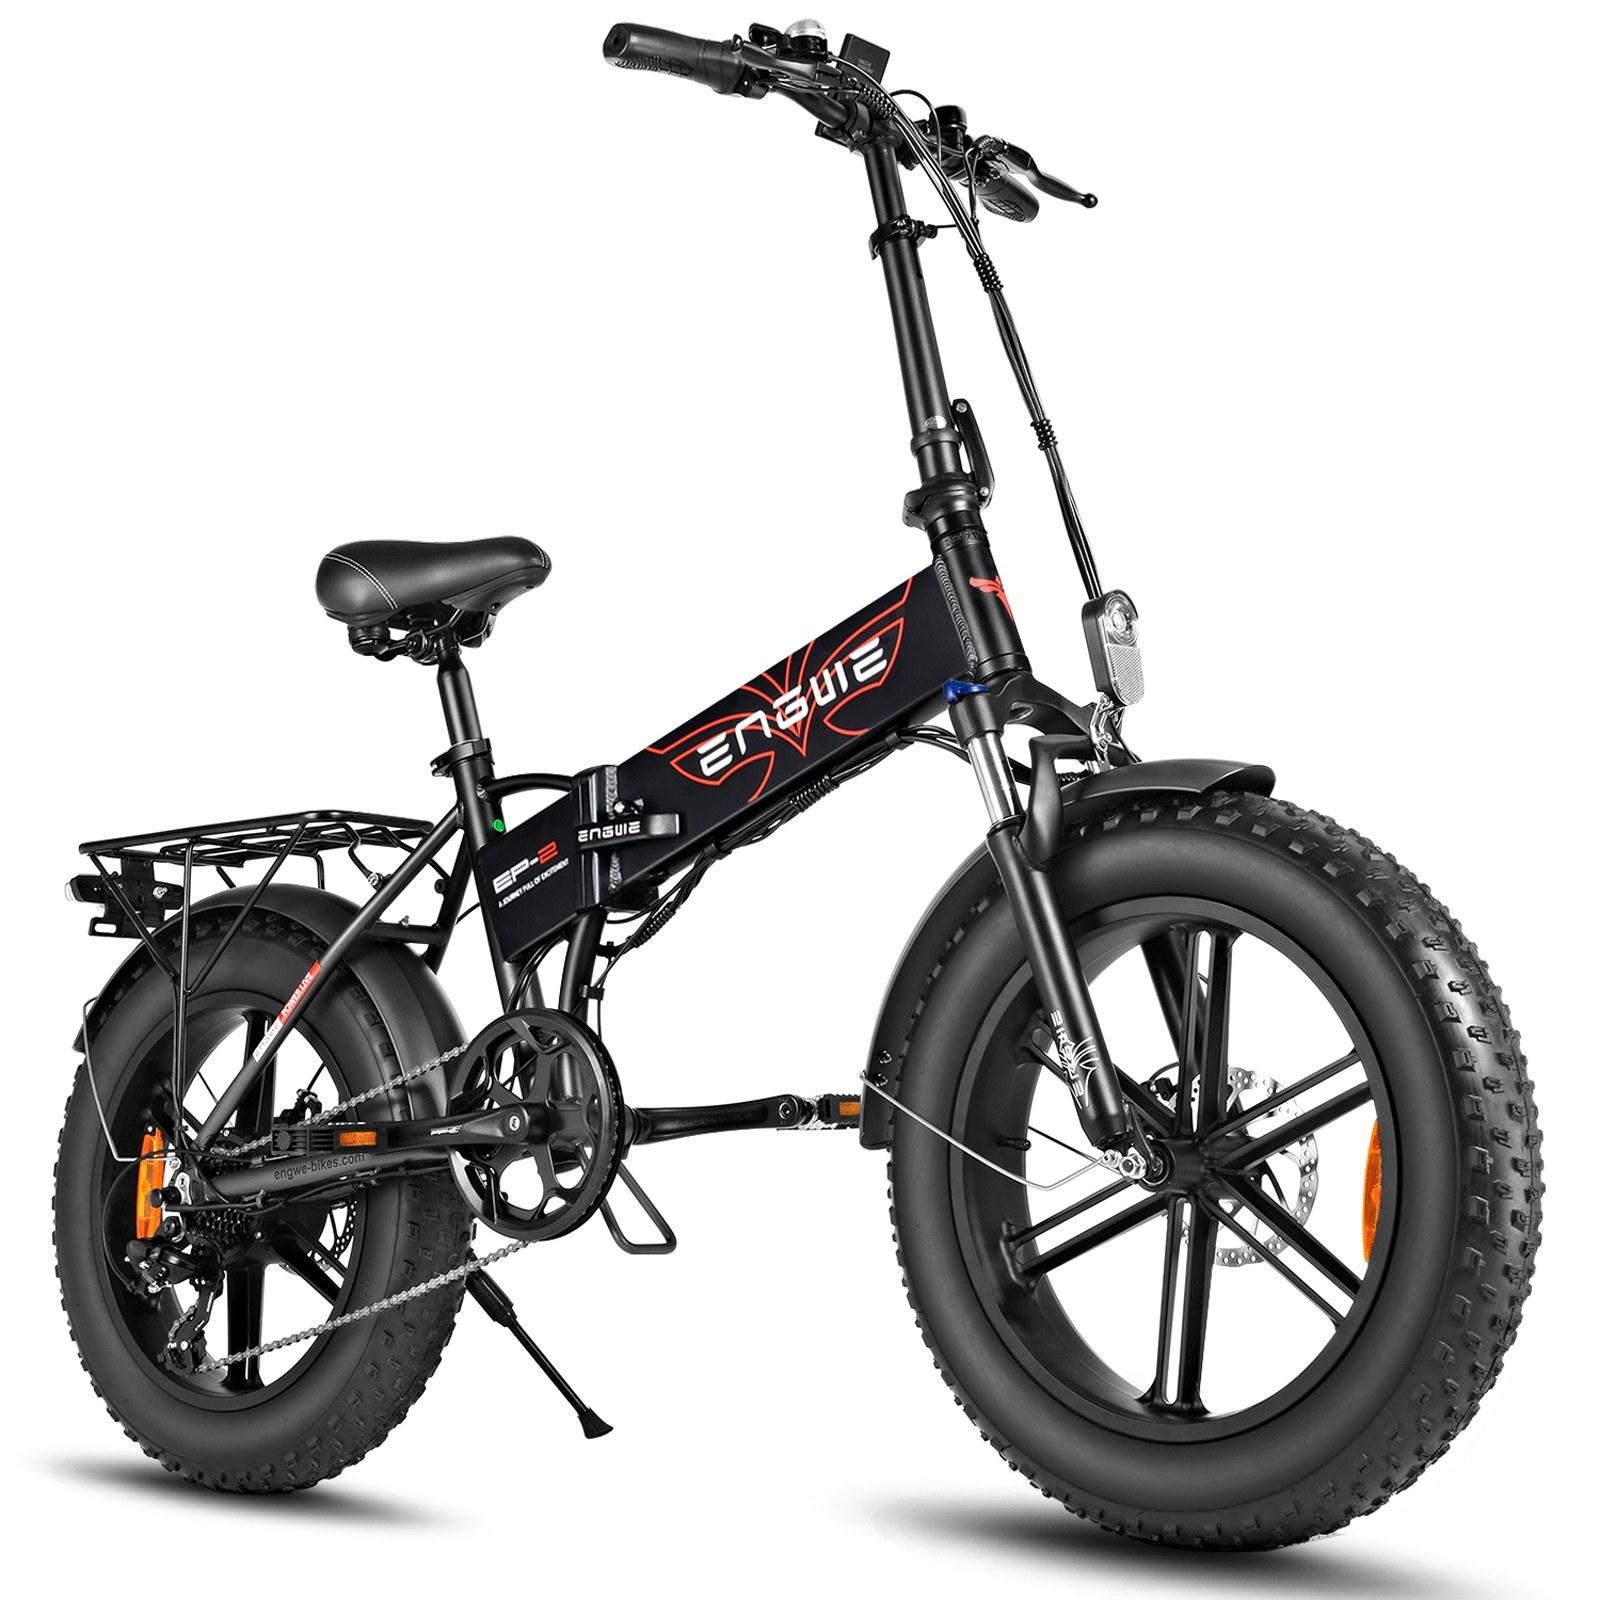 tomtop.com - [US Warehouse] ENGWE EP-2 PRO 20 Inch 750W Folding Electric Snow Bike 12.8AH 60-80km Range, $1069.99 (Inclusive of VAT)